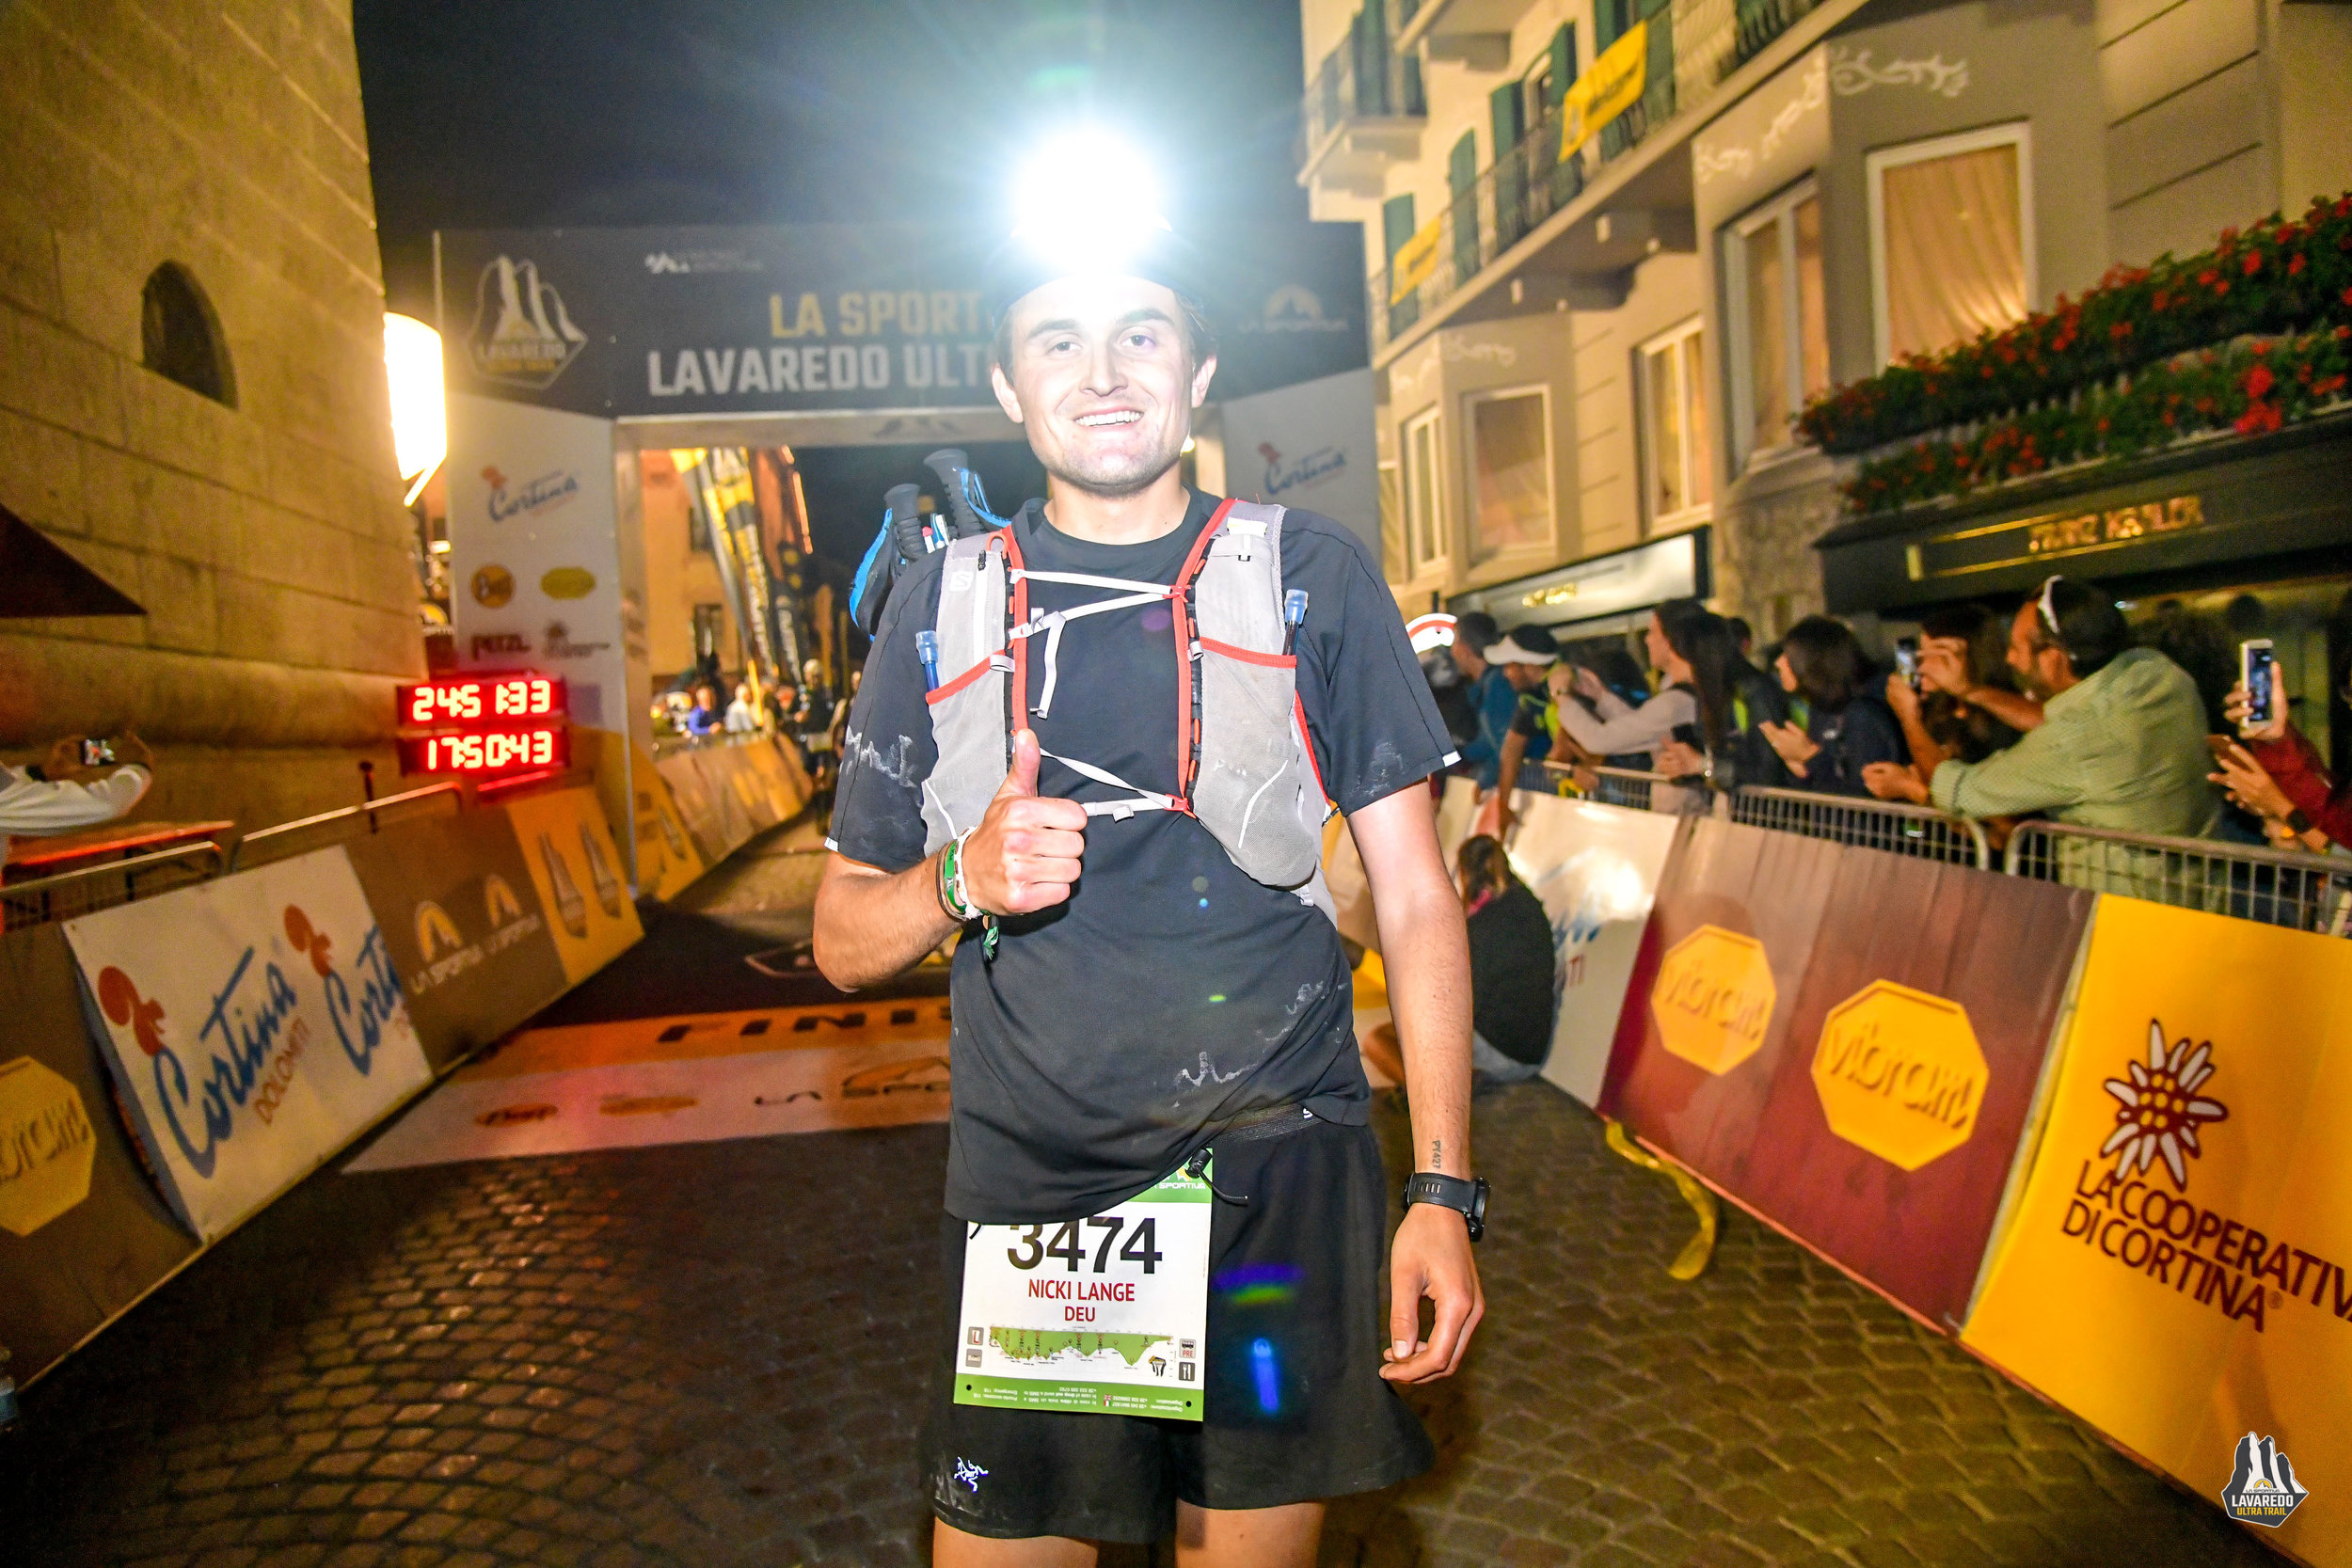 La-Sportiva-Lavaredo-Ultra-Trail-Ultra-Dolomites-2019-13.jpg